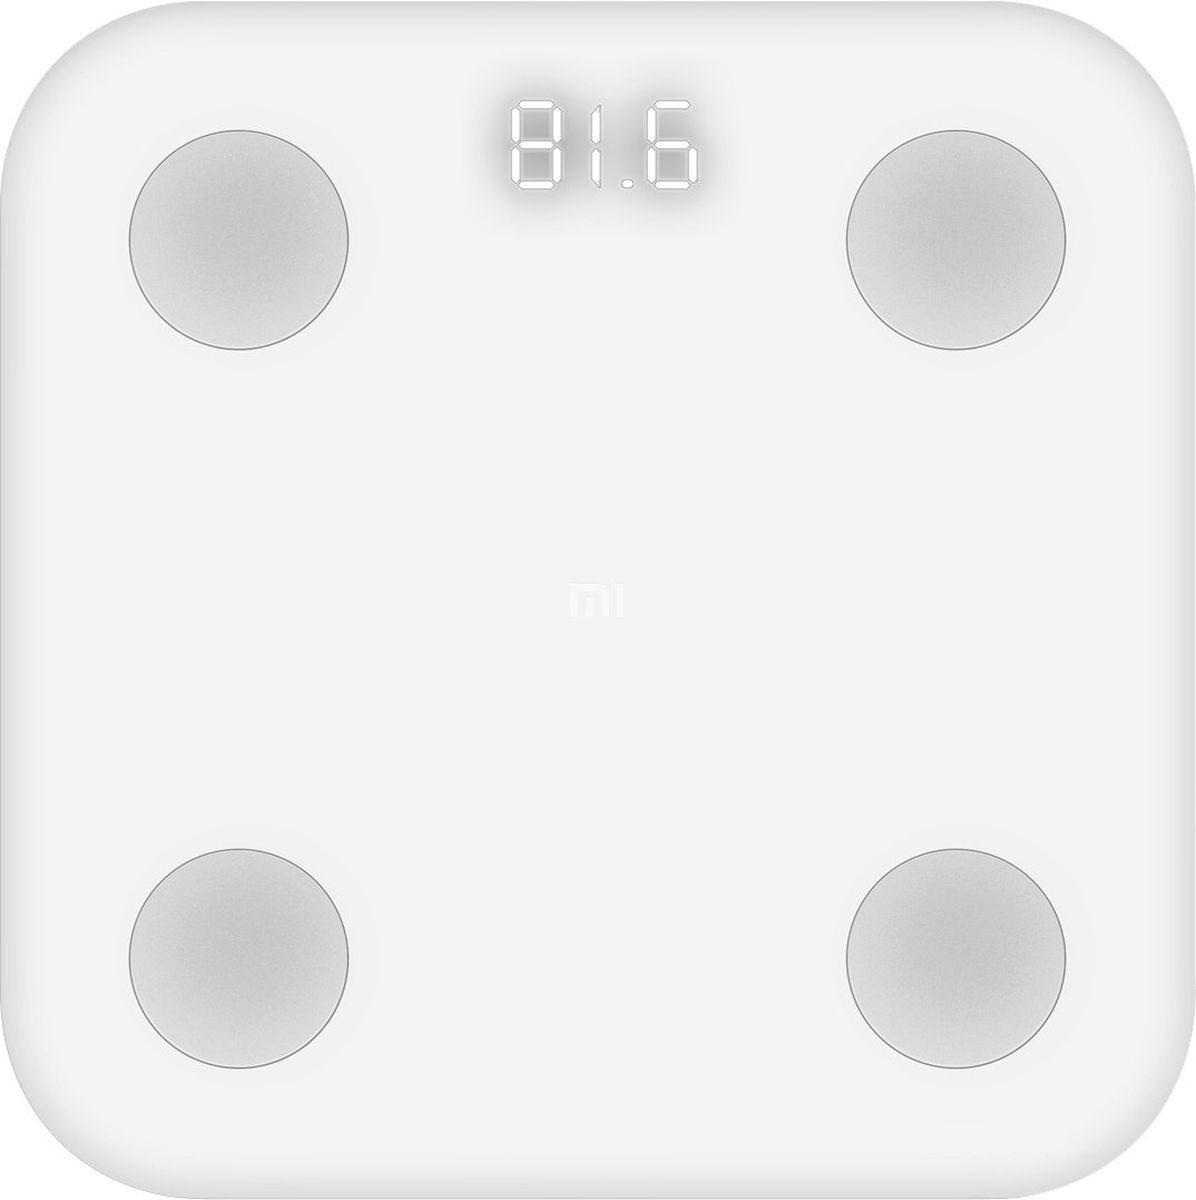 Напольные весы Xiaomi Mi Body Composition Scale 2 #1